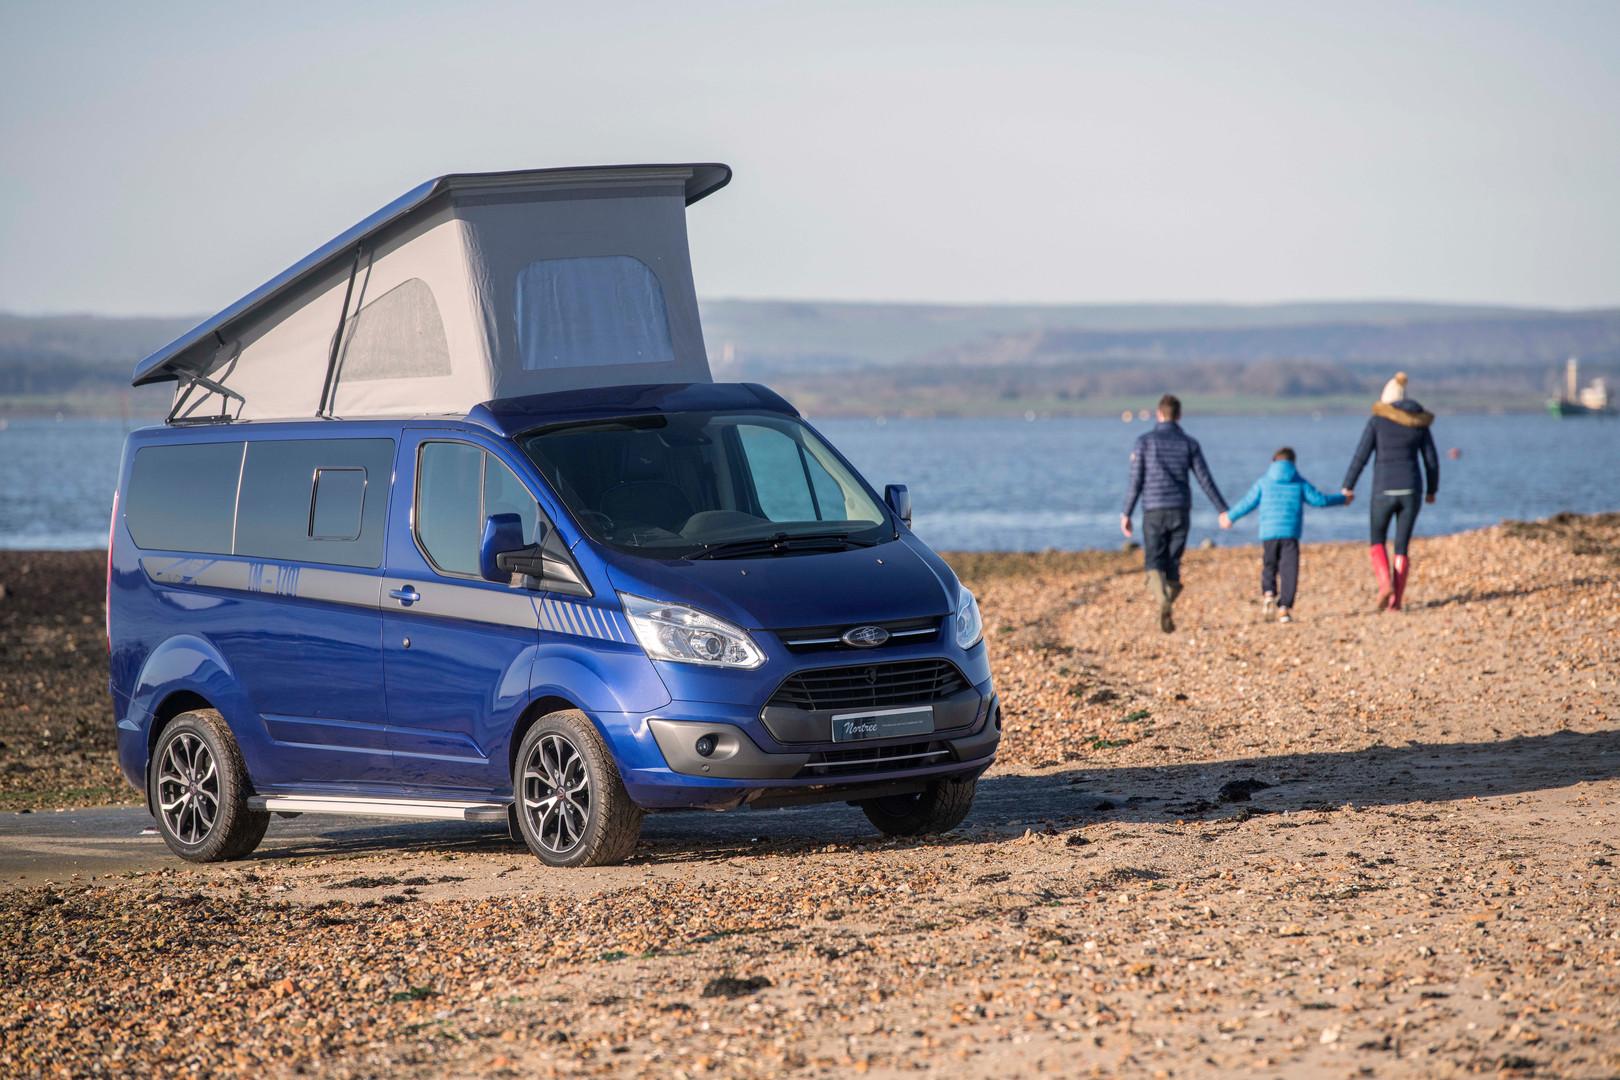 Advertising picture for a bespoke campervan builder